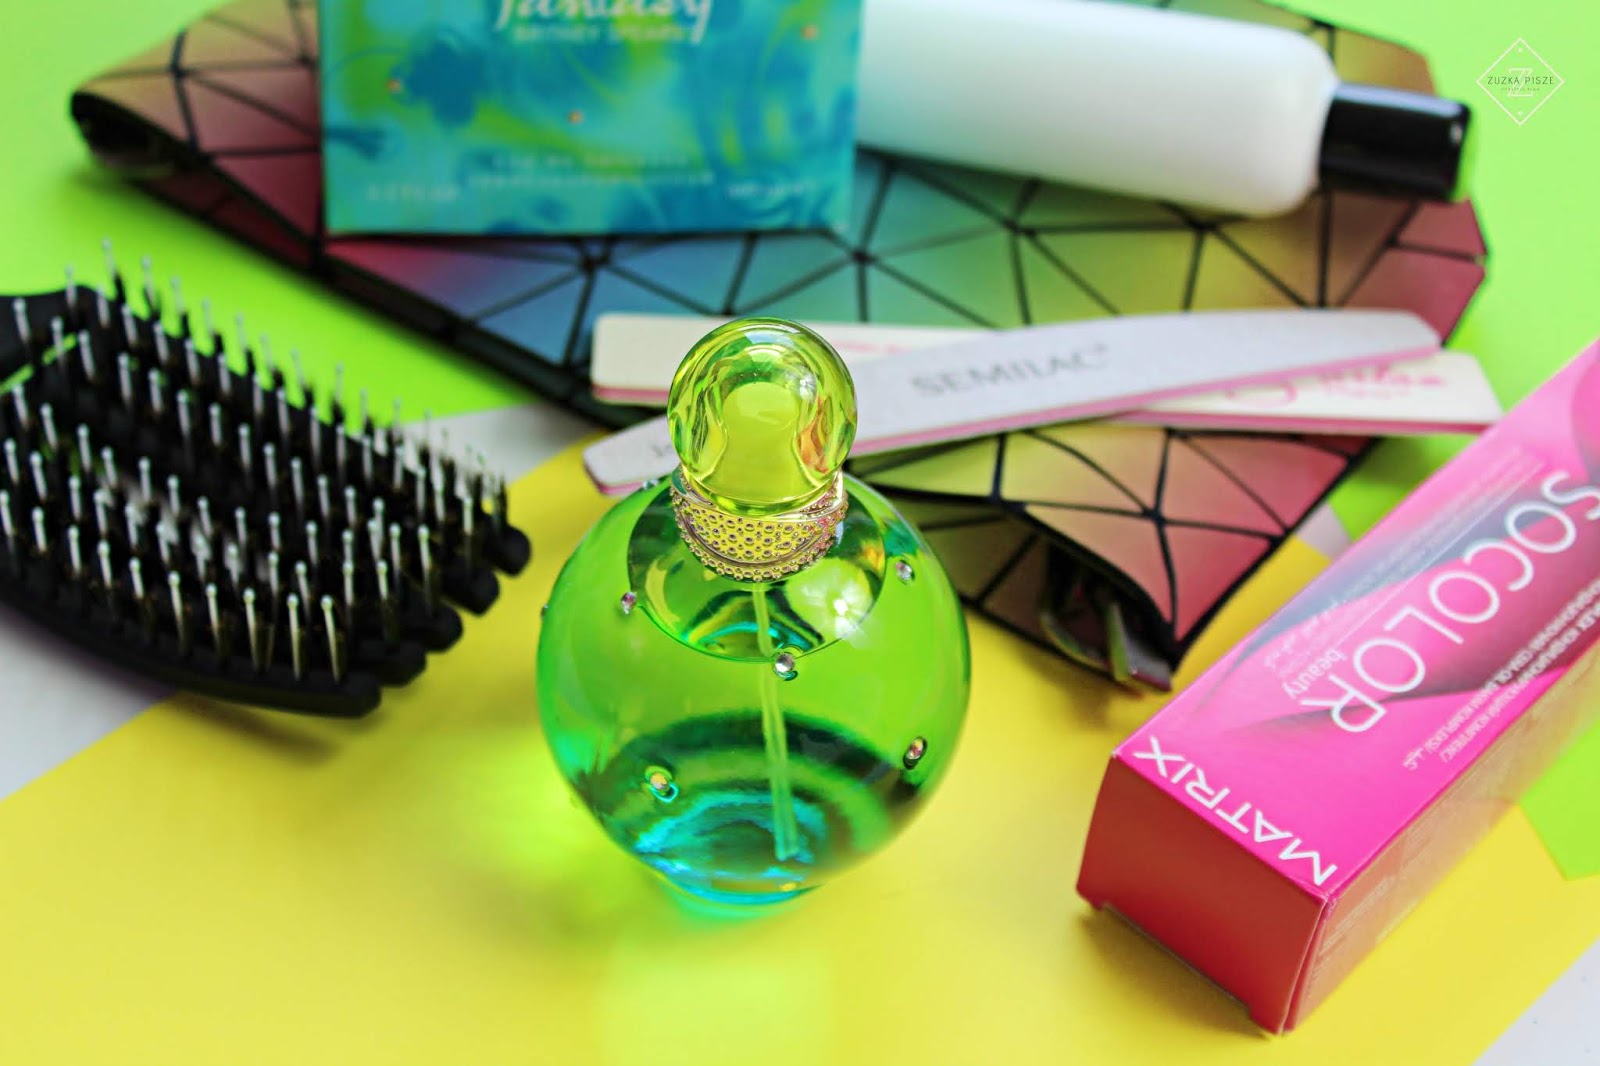 Moje ostatnie odkrycie - sklep Hairstore.pl